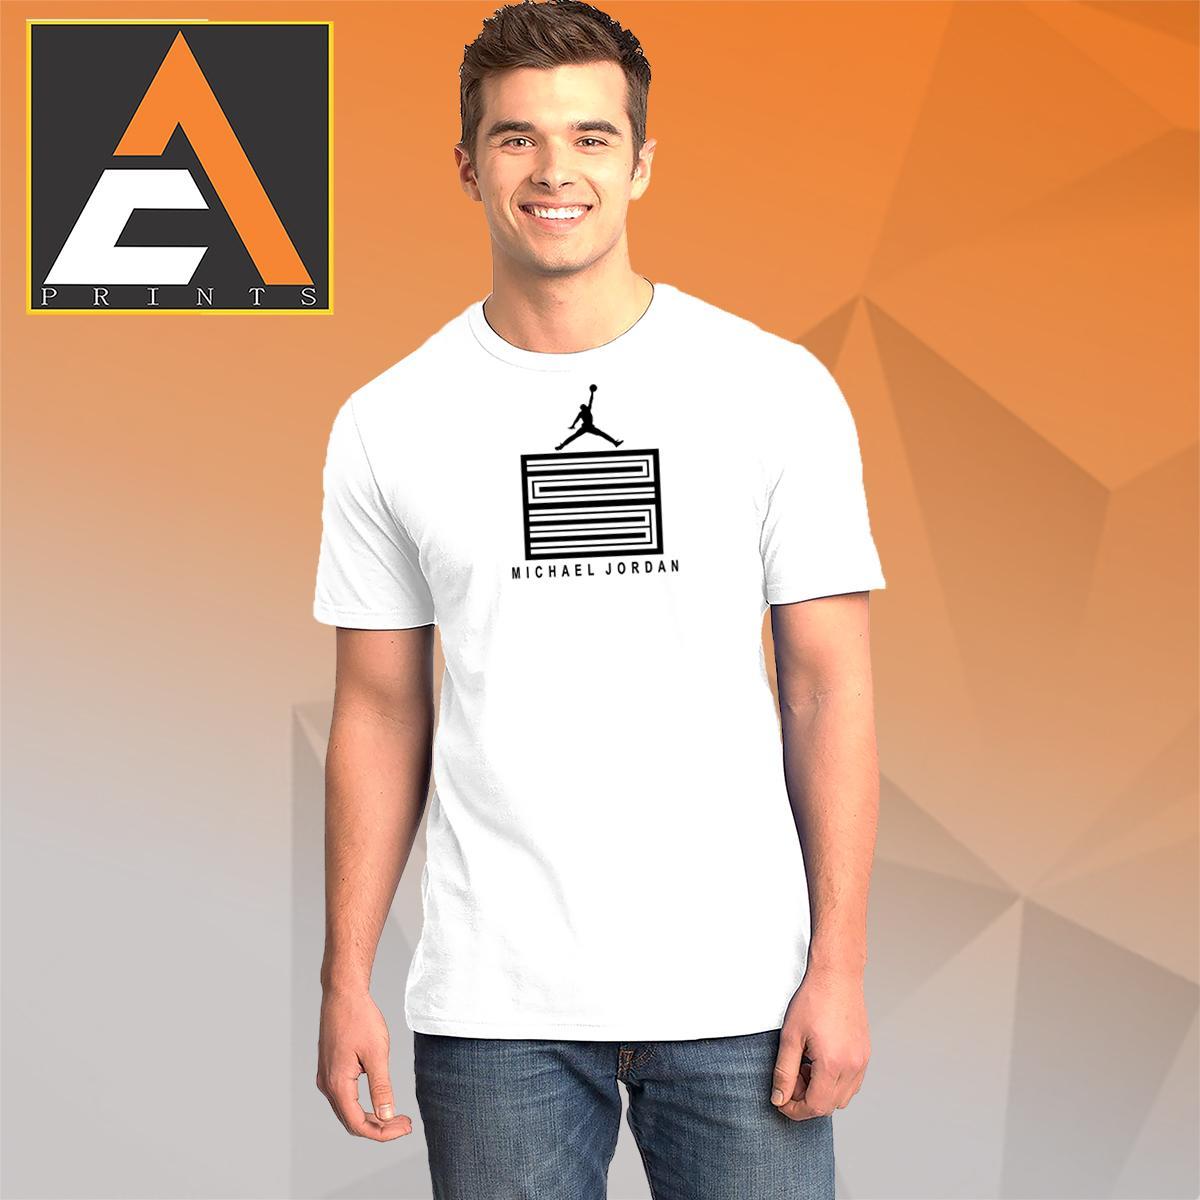 b8a9c6e17fffd4 T-Shirt Clothing for Men for sale - Mens Shirt Clothing online brands